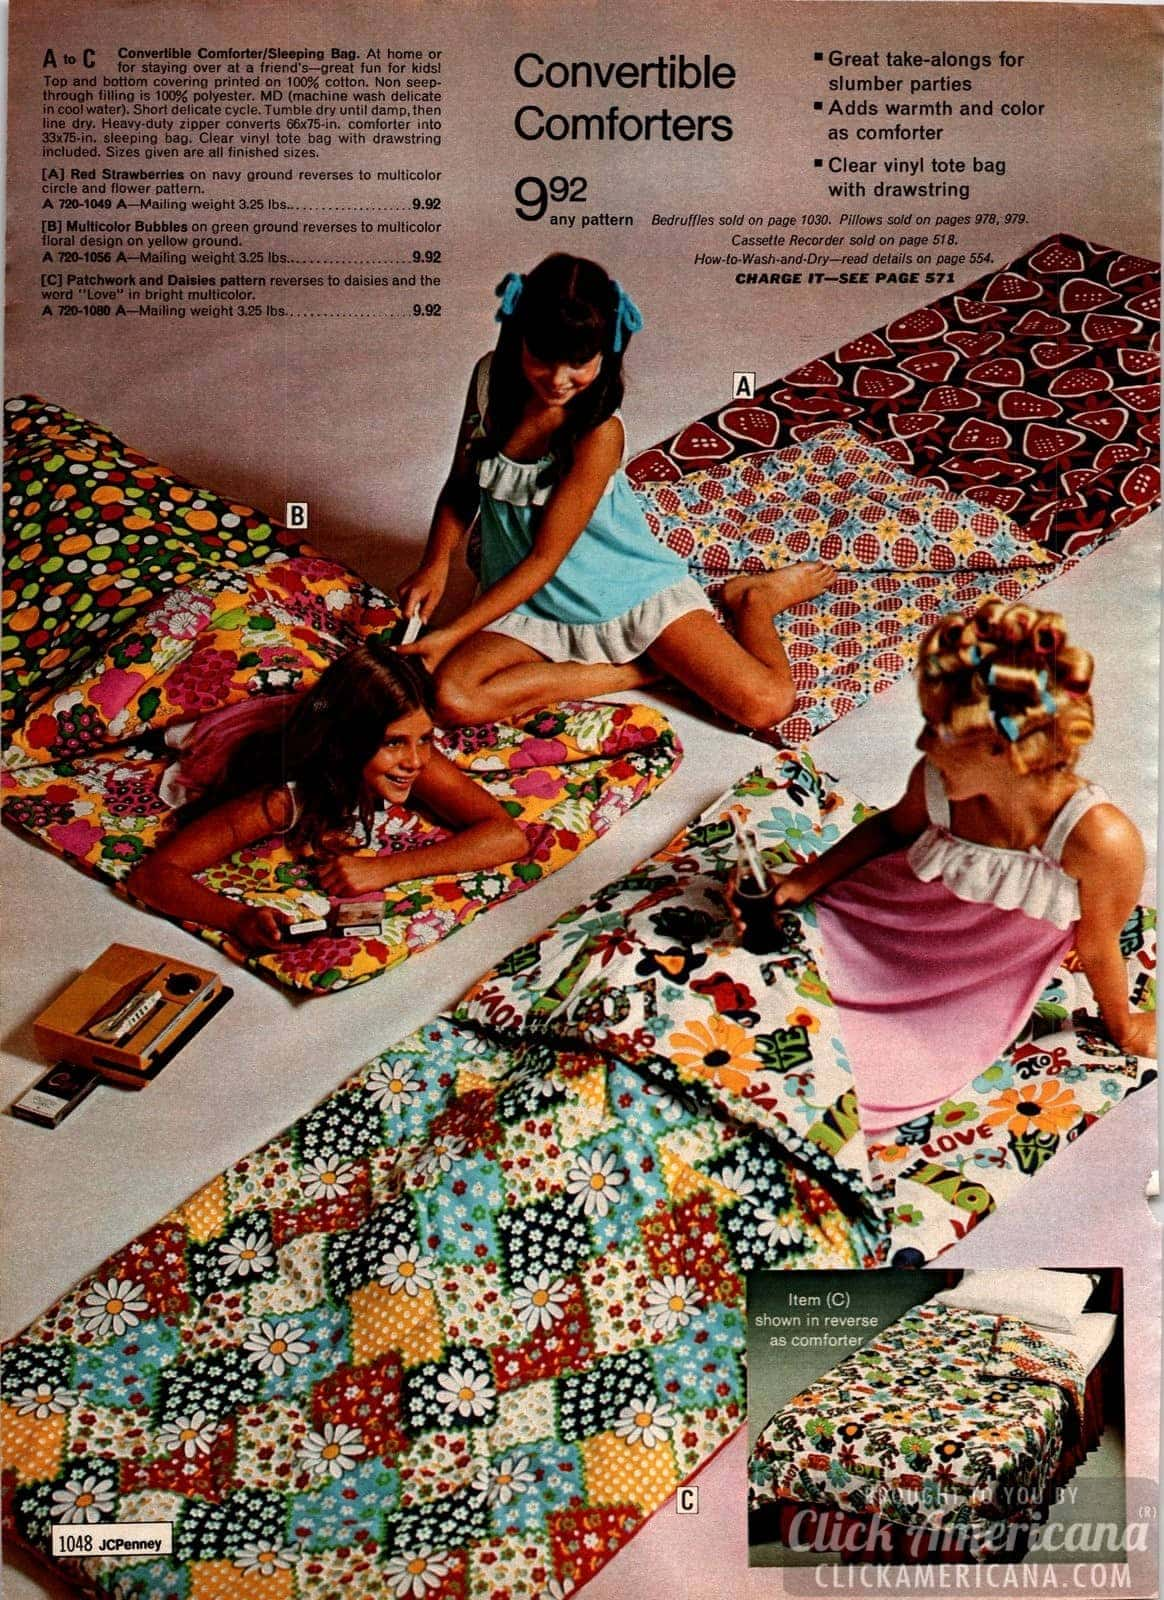 Retro sleeping bags for girls - slumber party comforters